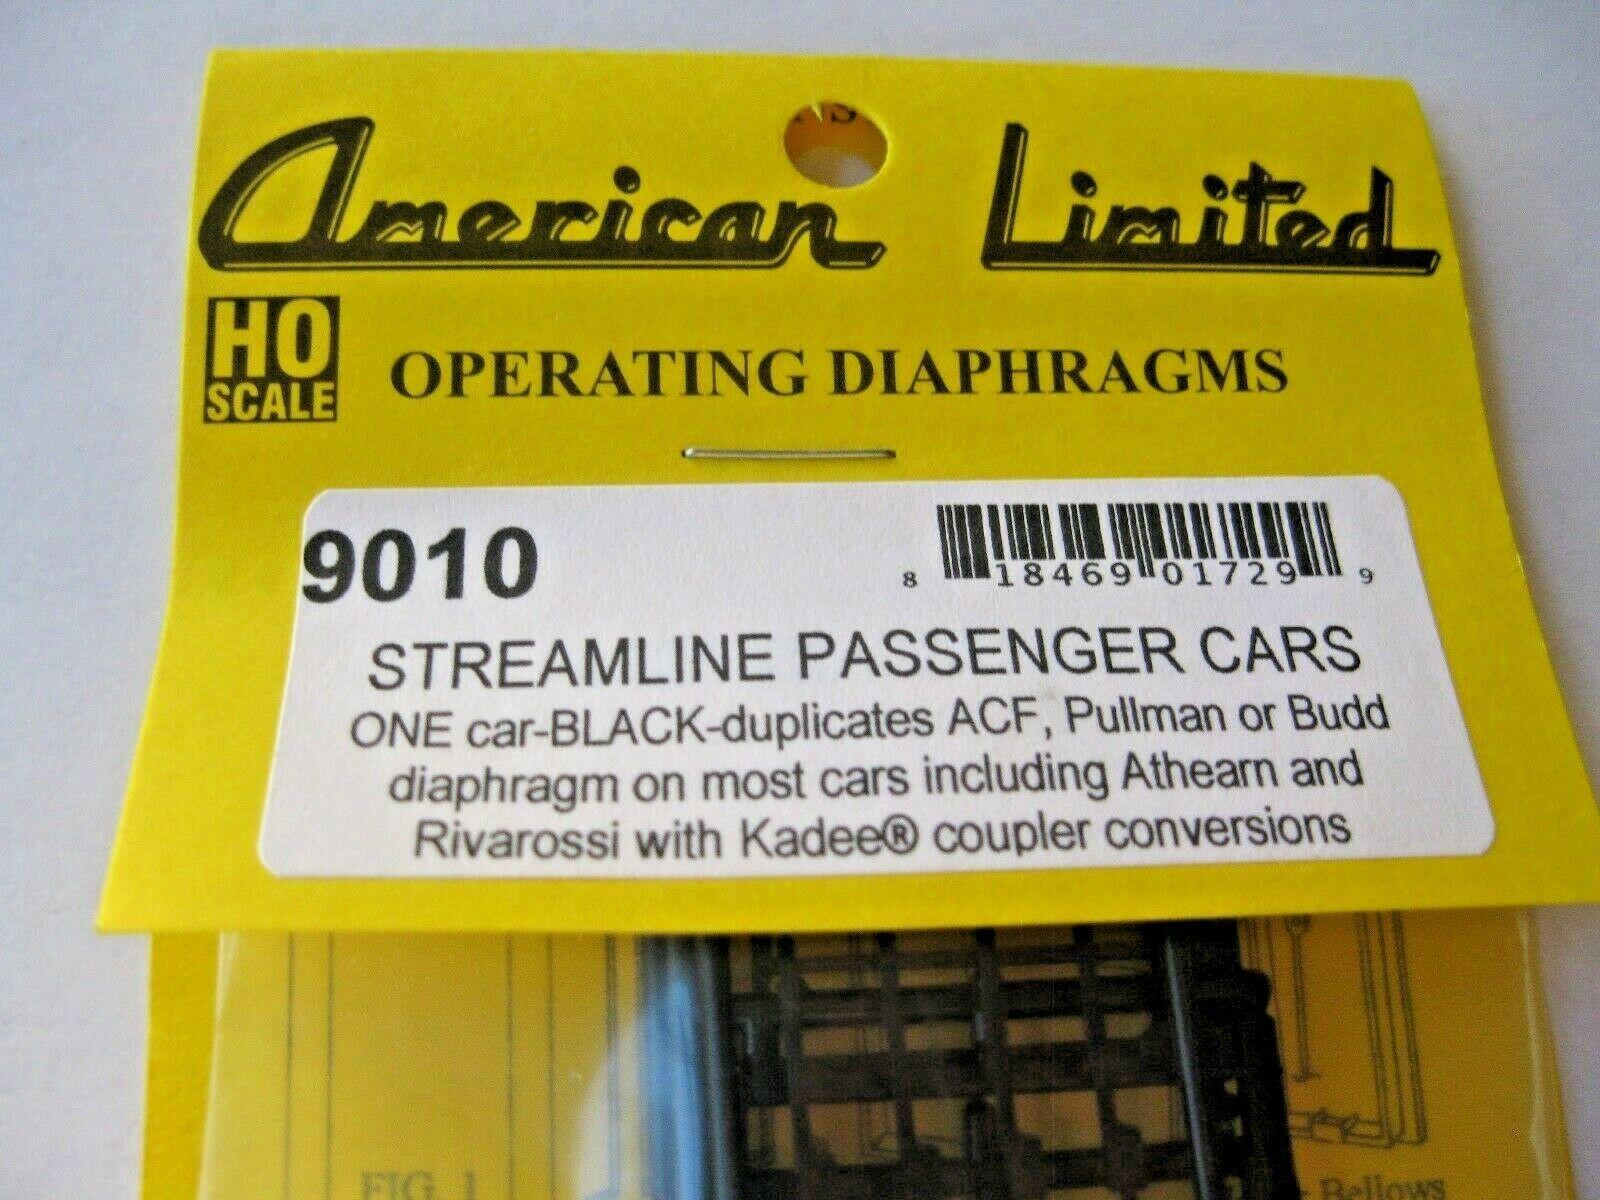 American Limited #9010 Streamline Passenger Car Diaphragms for 1 Car HO-Scale